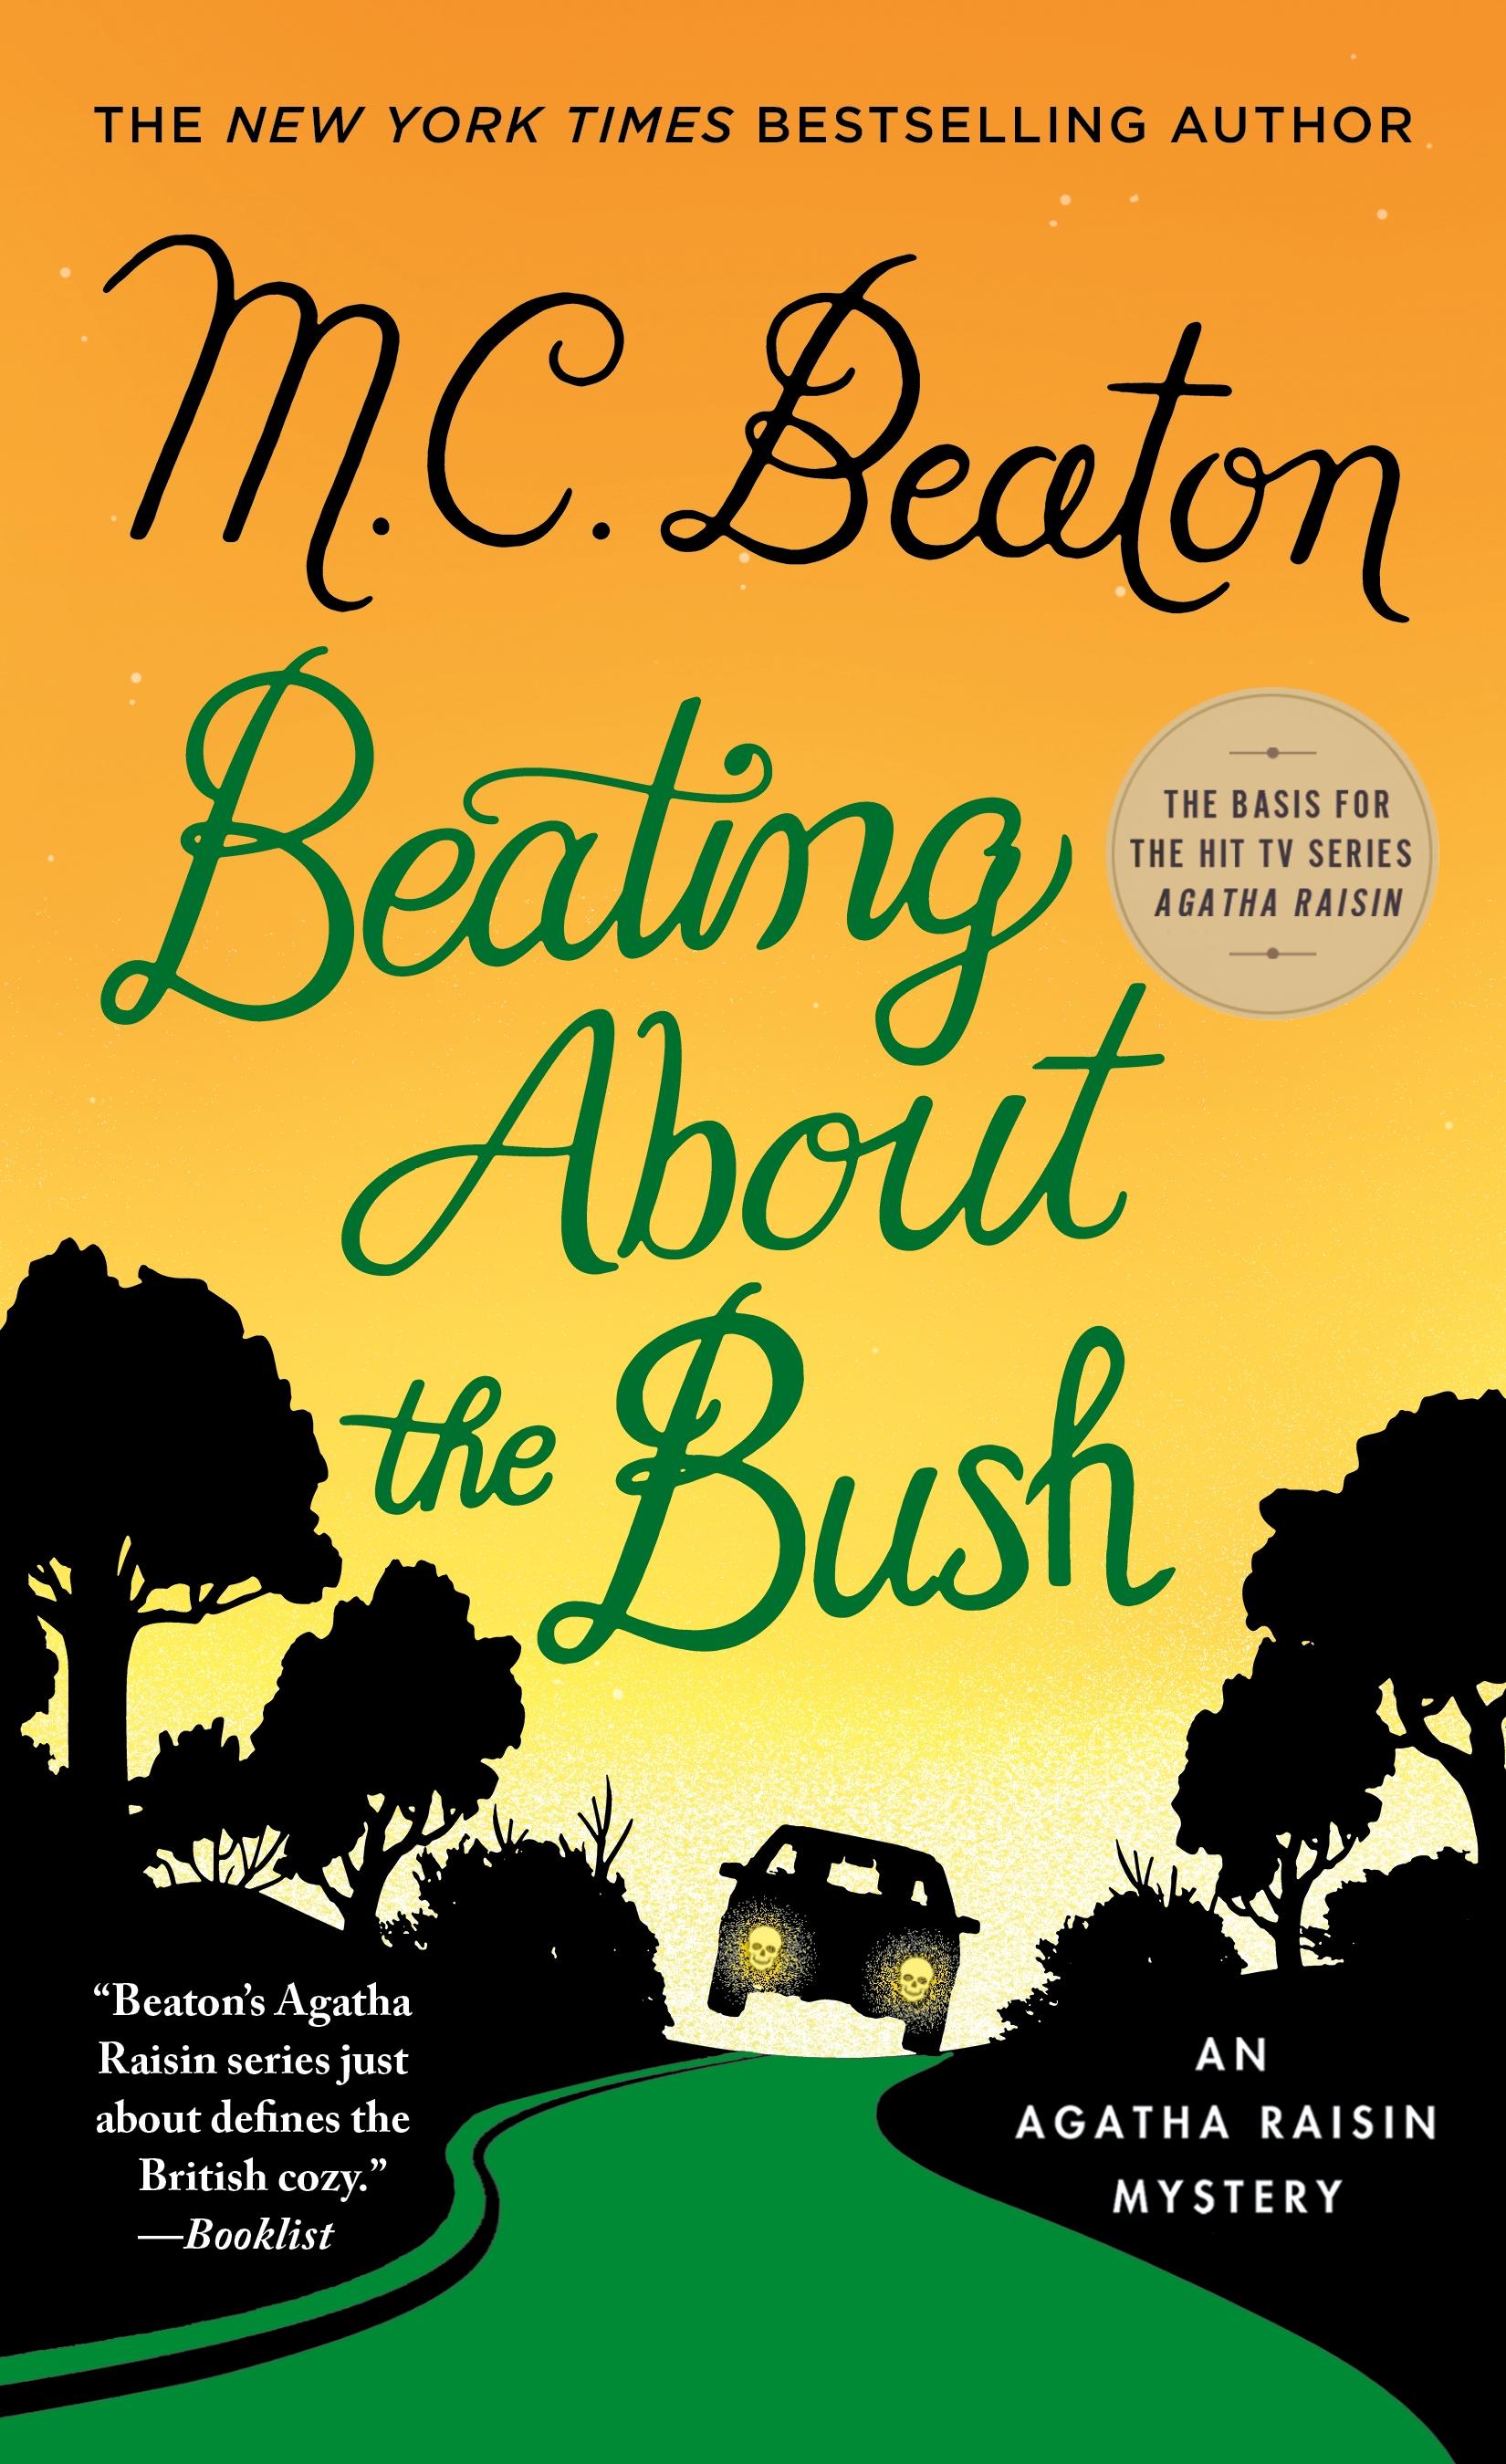 Beating About the Bush An Agatha Raisin Mystery